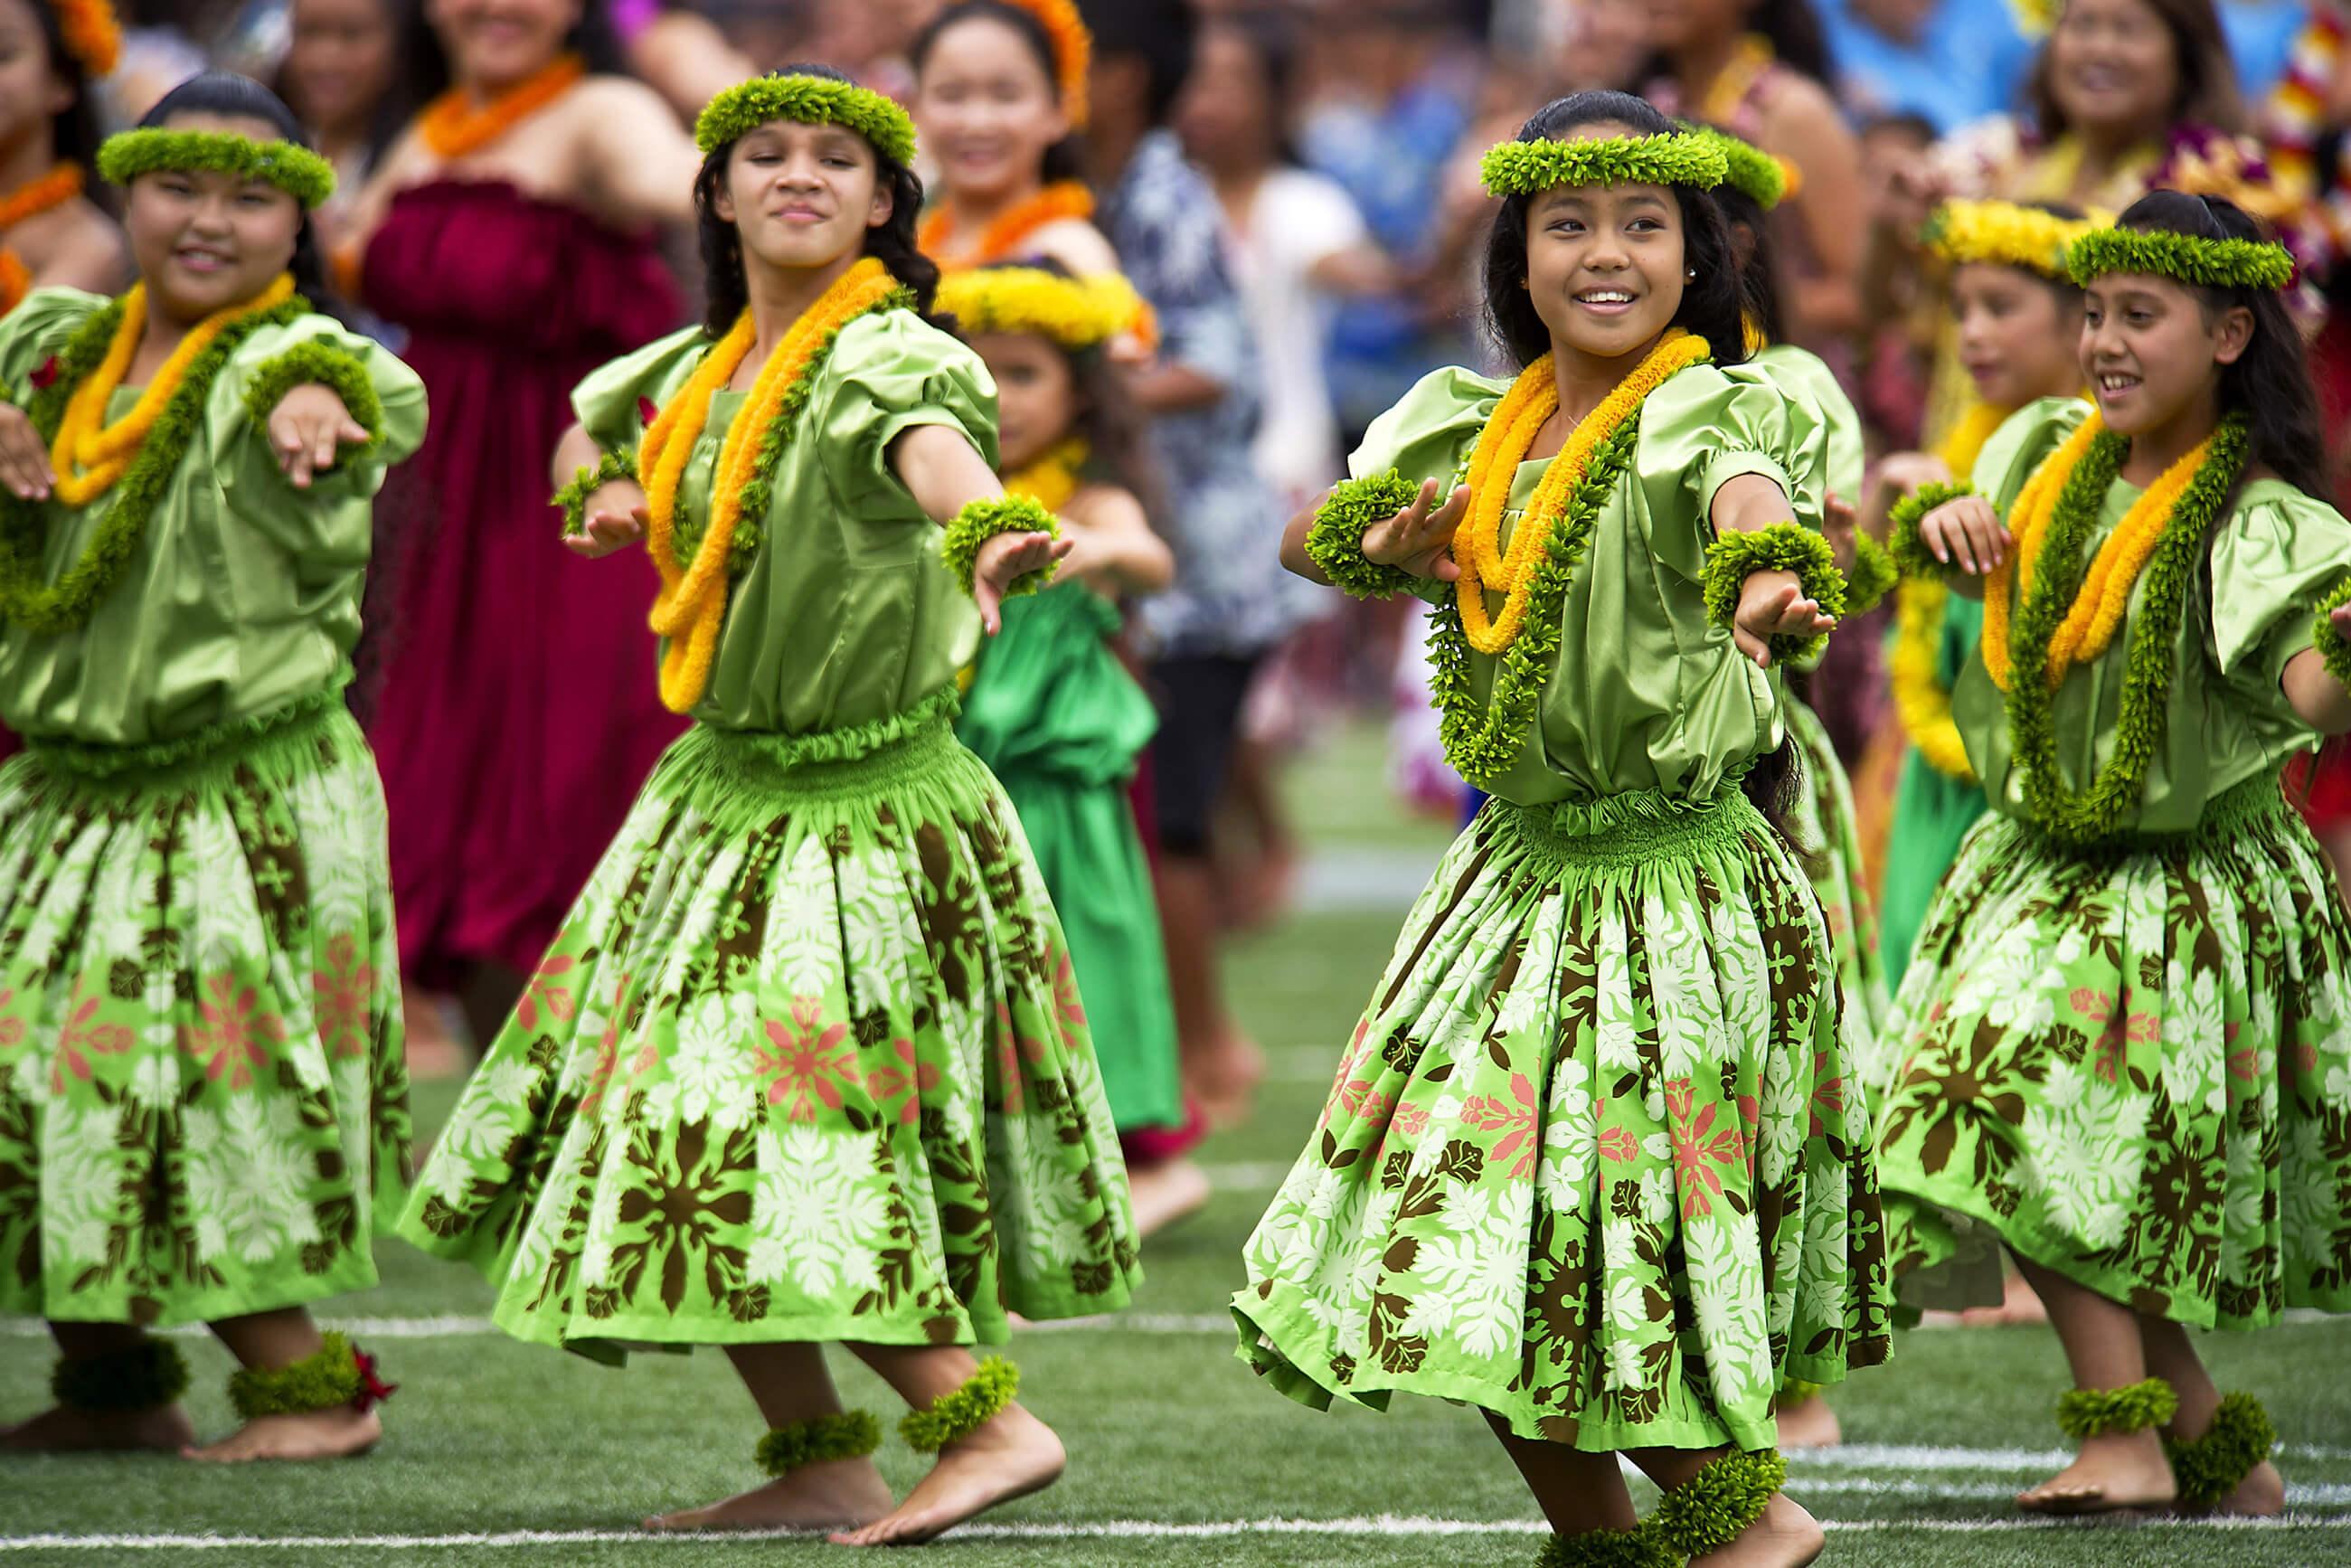 https://bubo.sk/uploads/galleries/16052/hawaiian-hula-dancers-377653.jpg